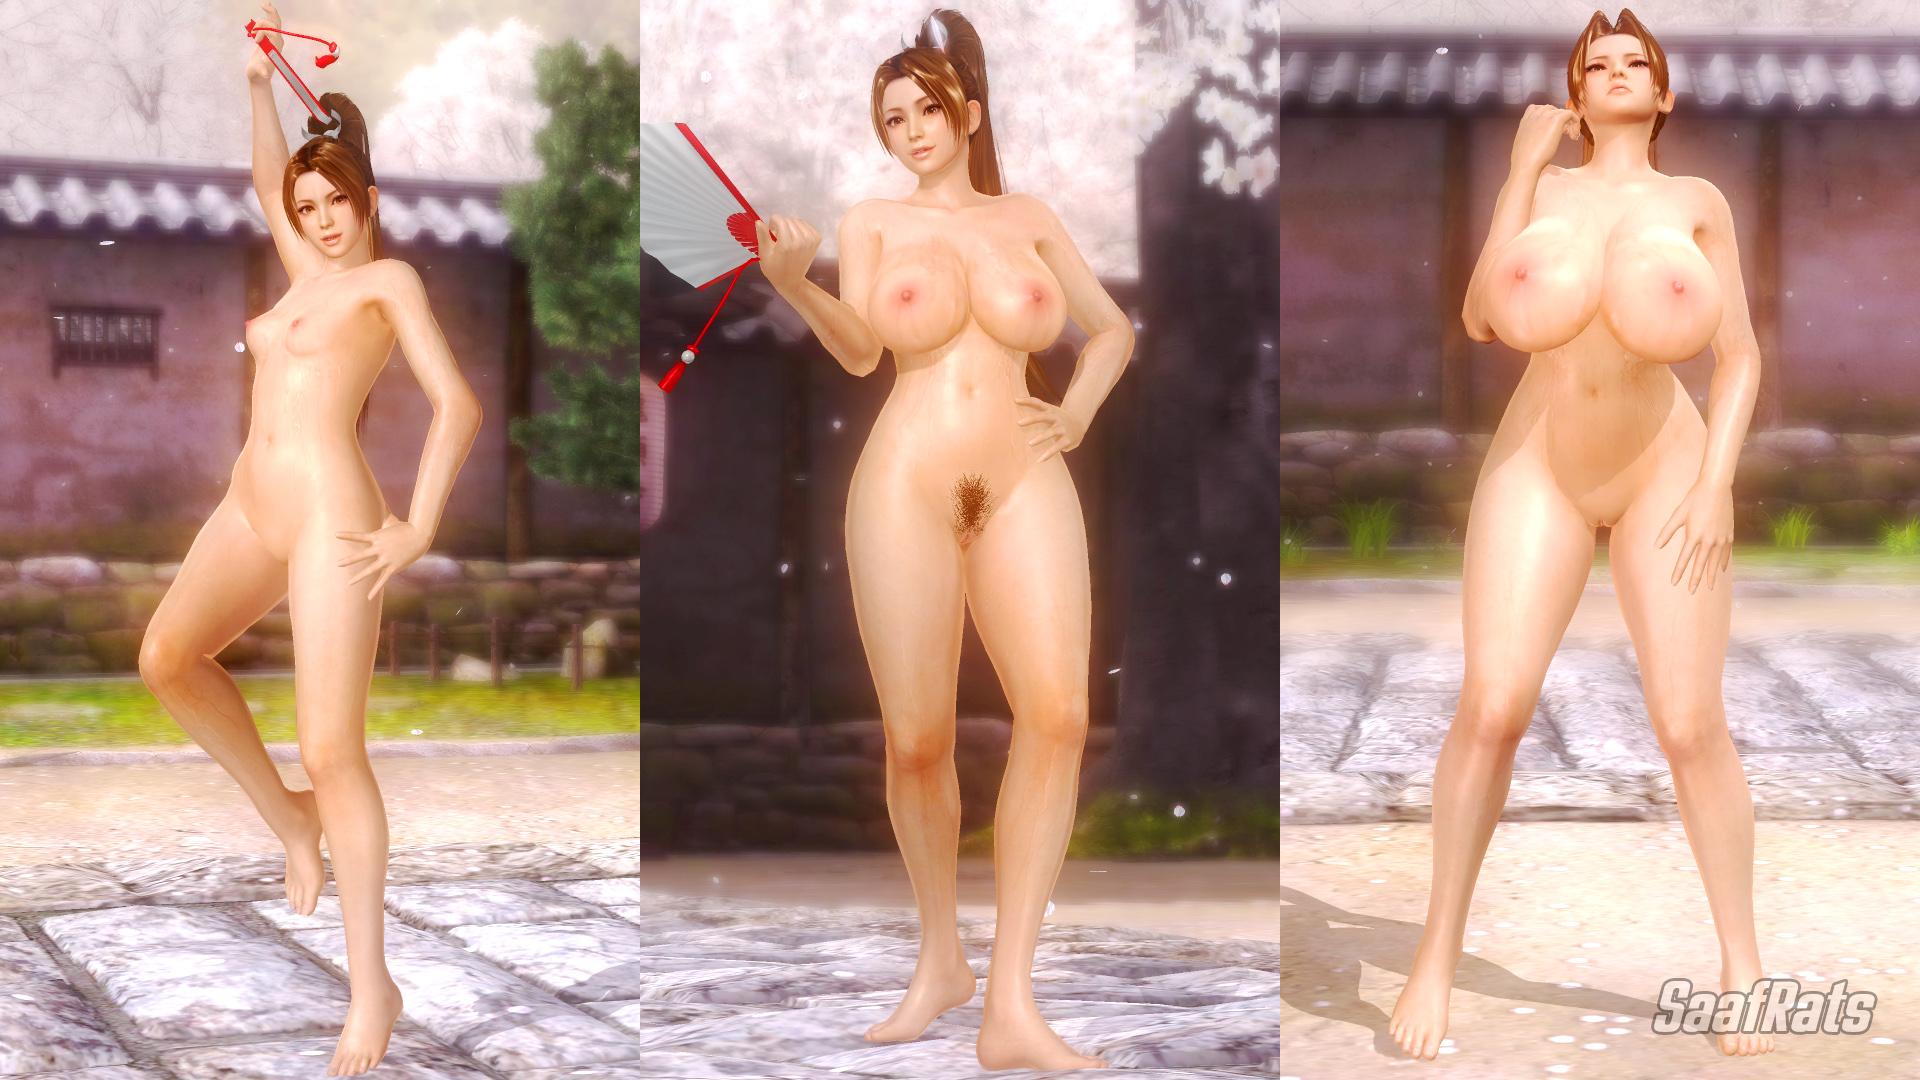 Doa nude skins nackt movie